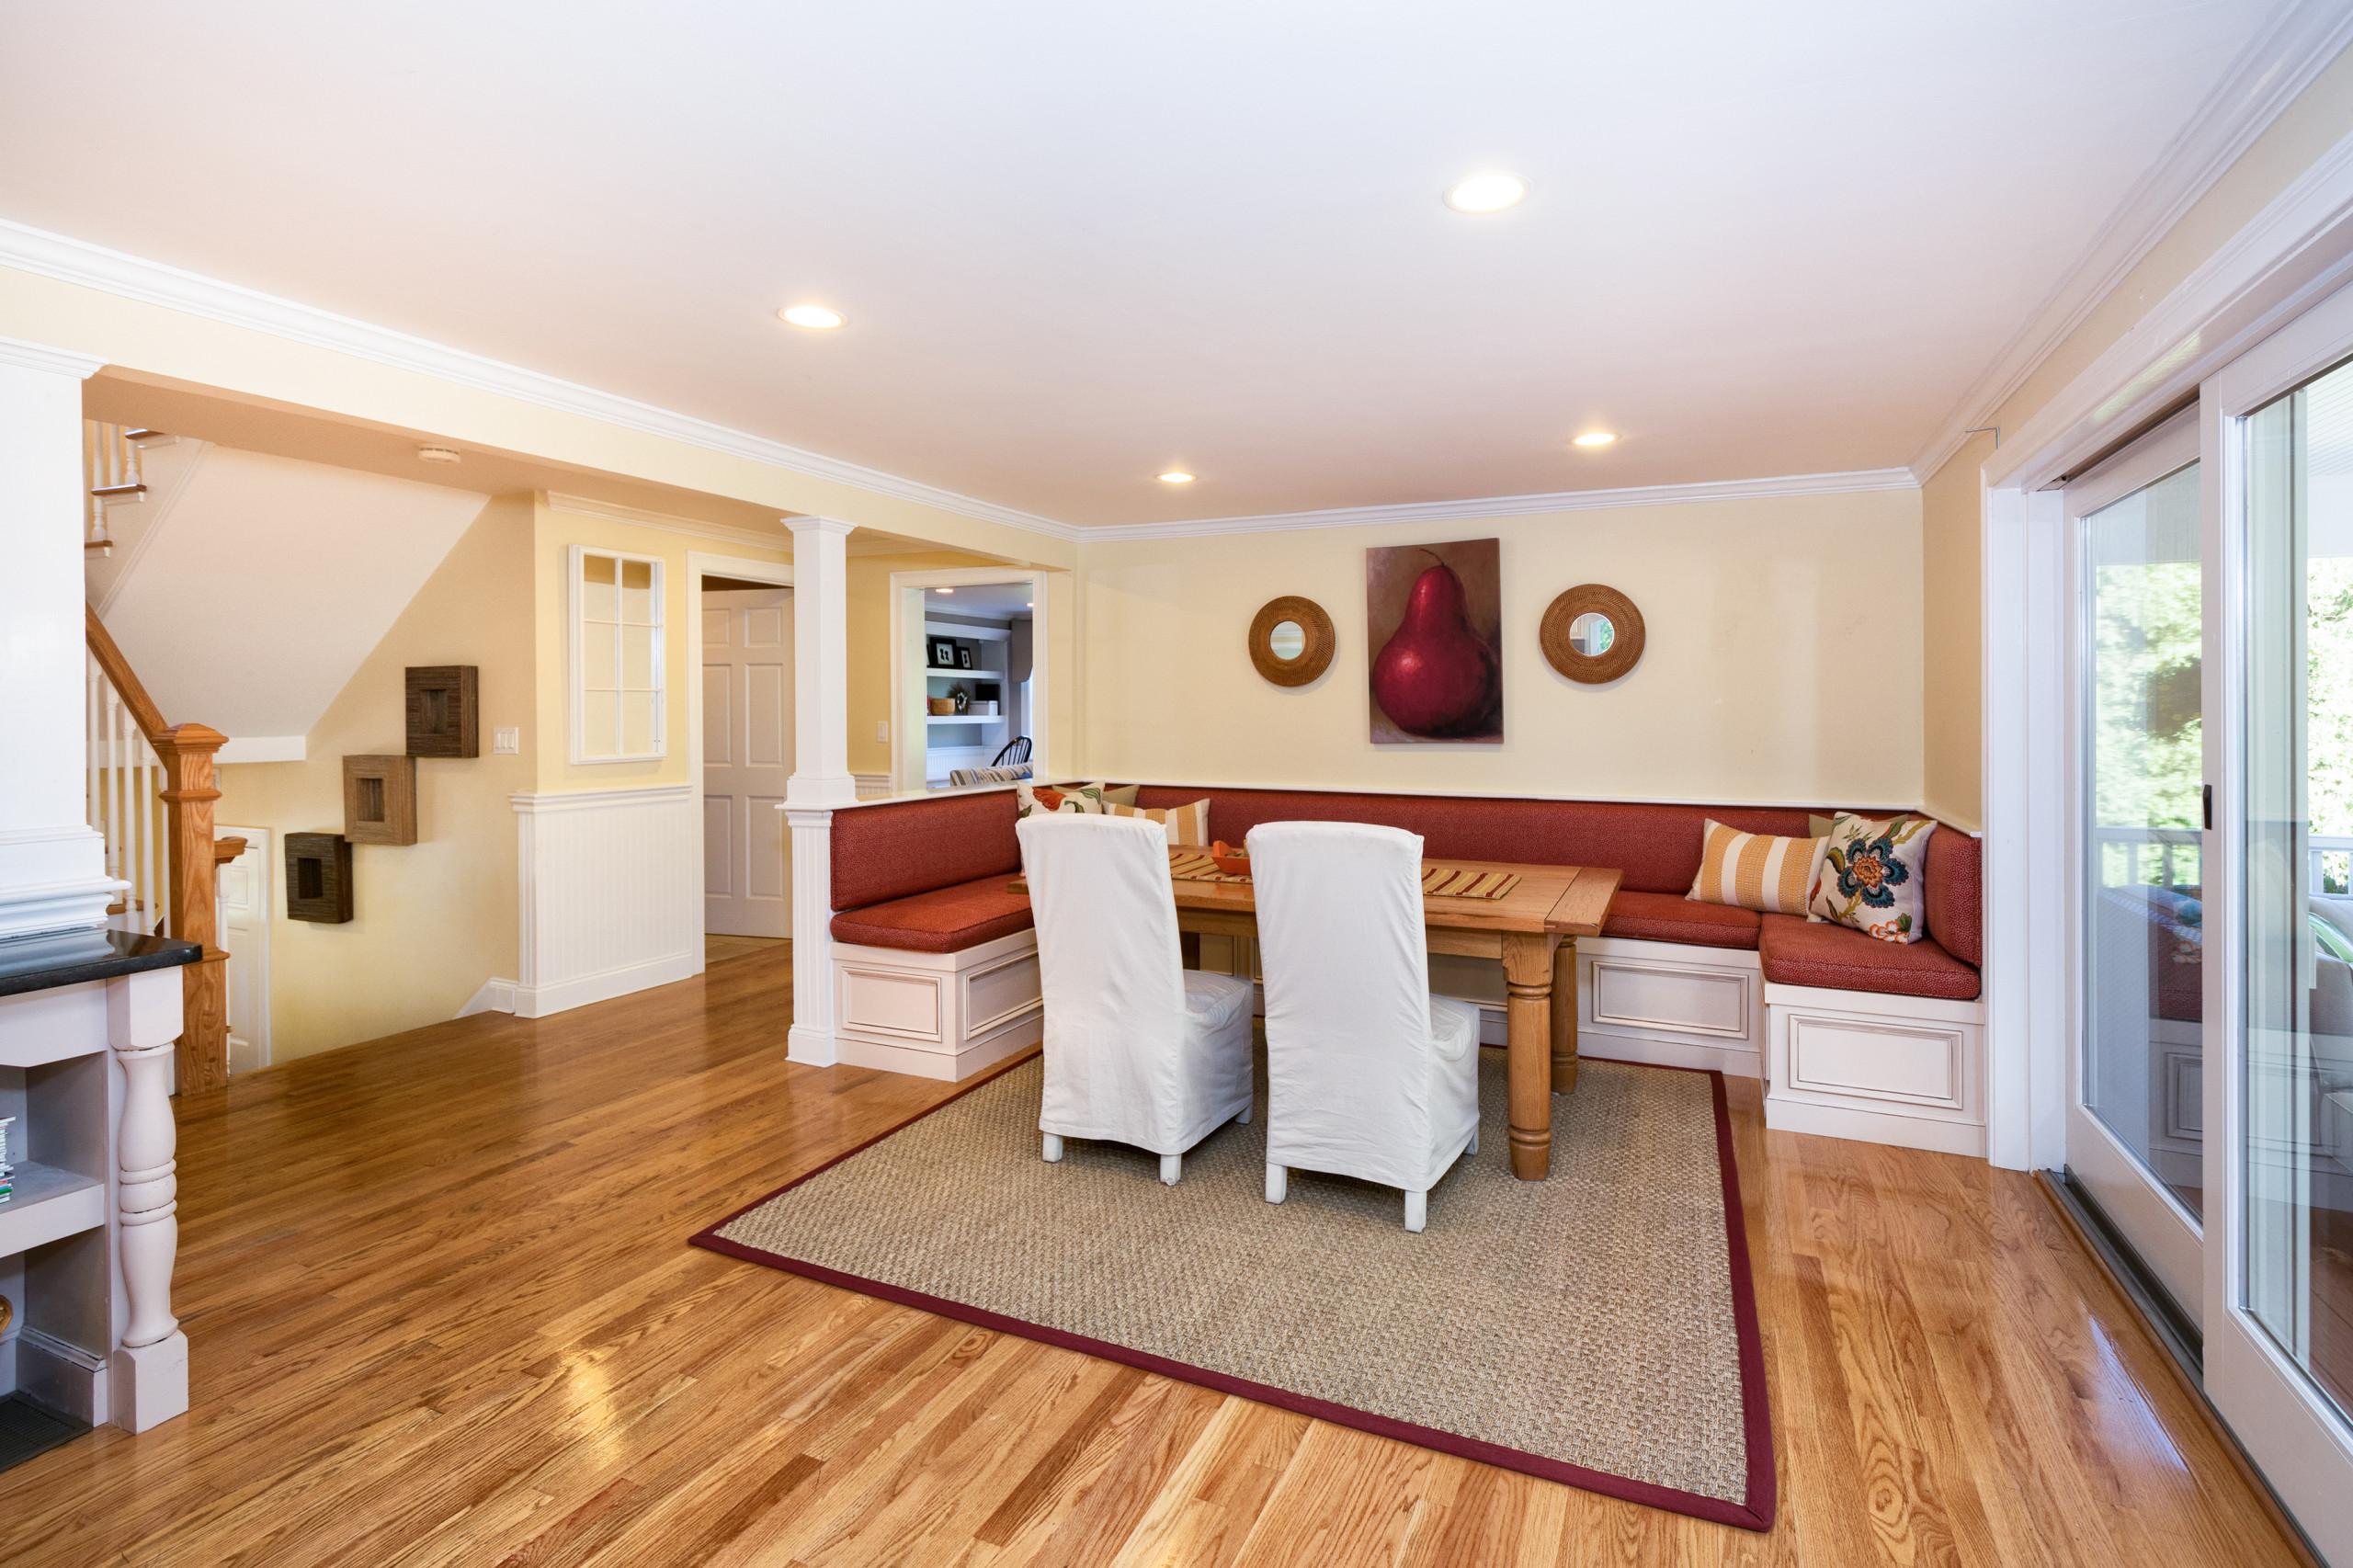 Cohasset's 1st LEED Home